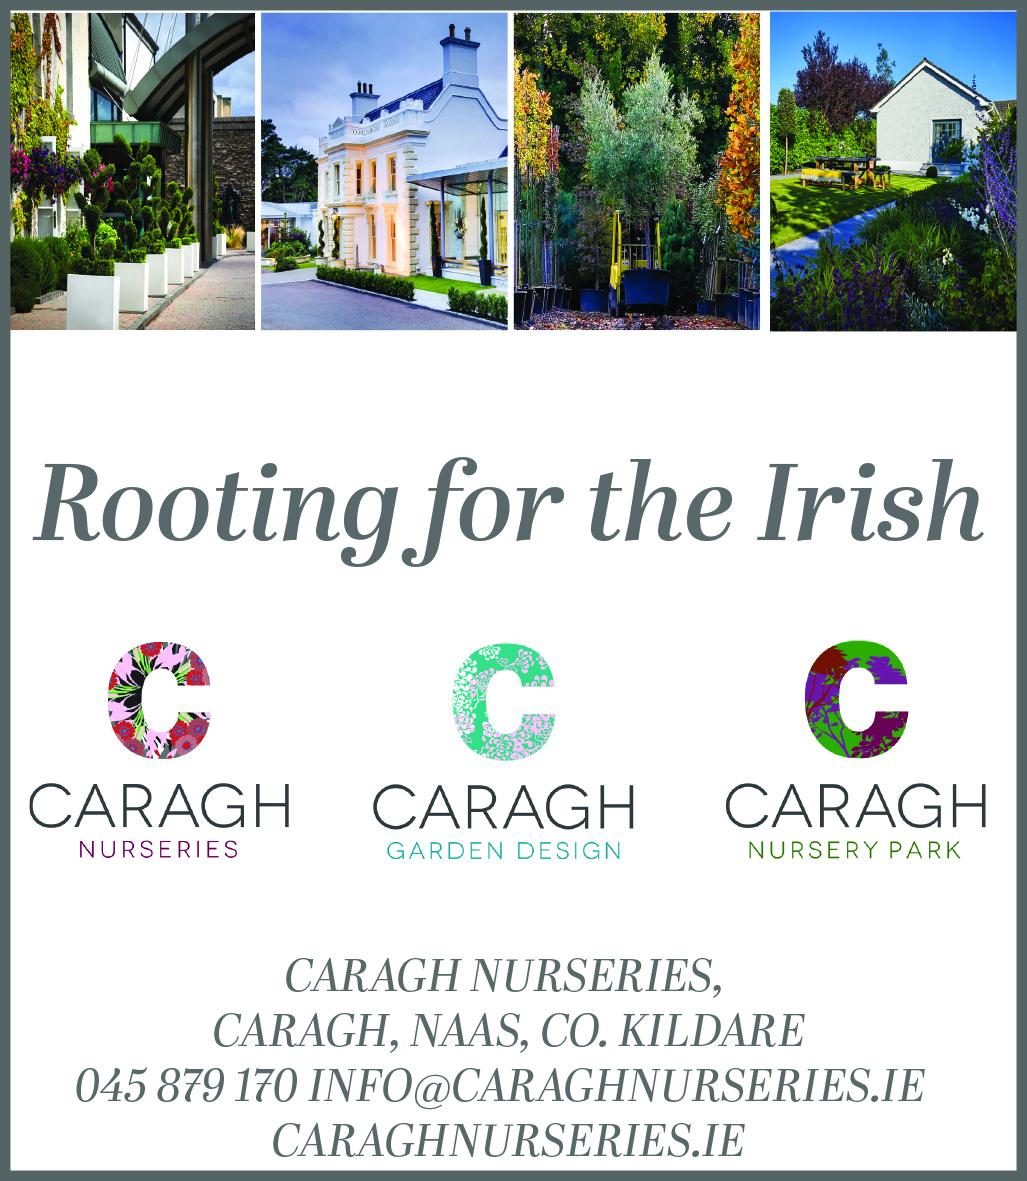 Kildare, Ireland Networking Events | Eventbrite